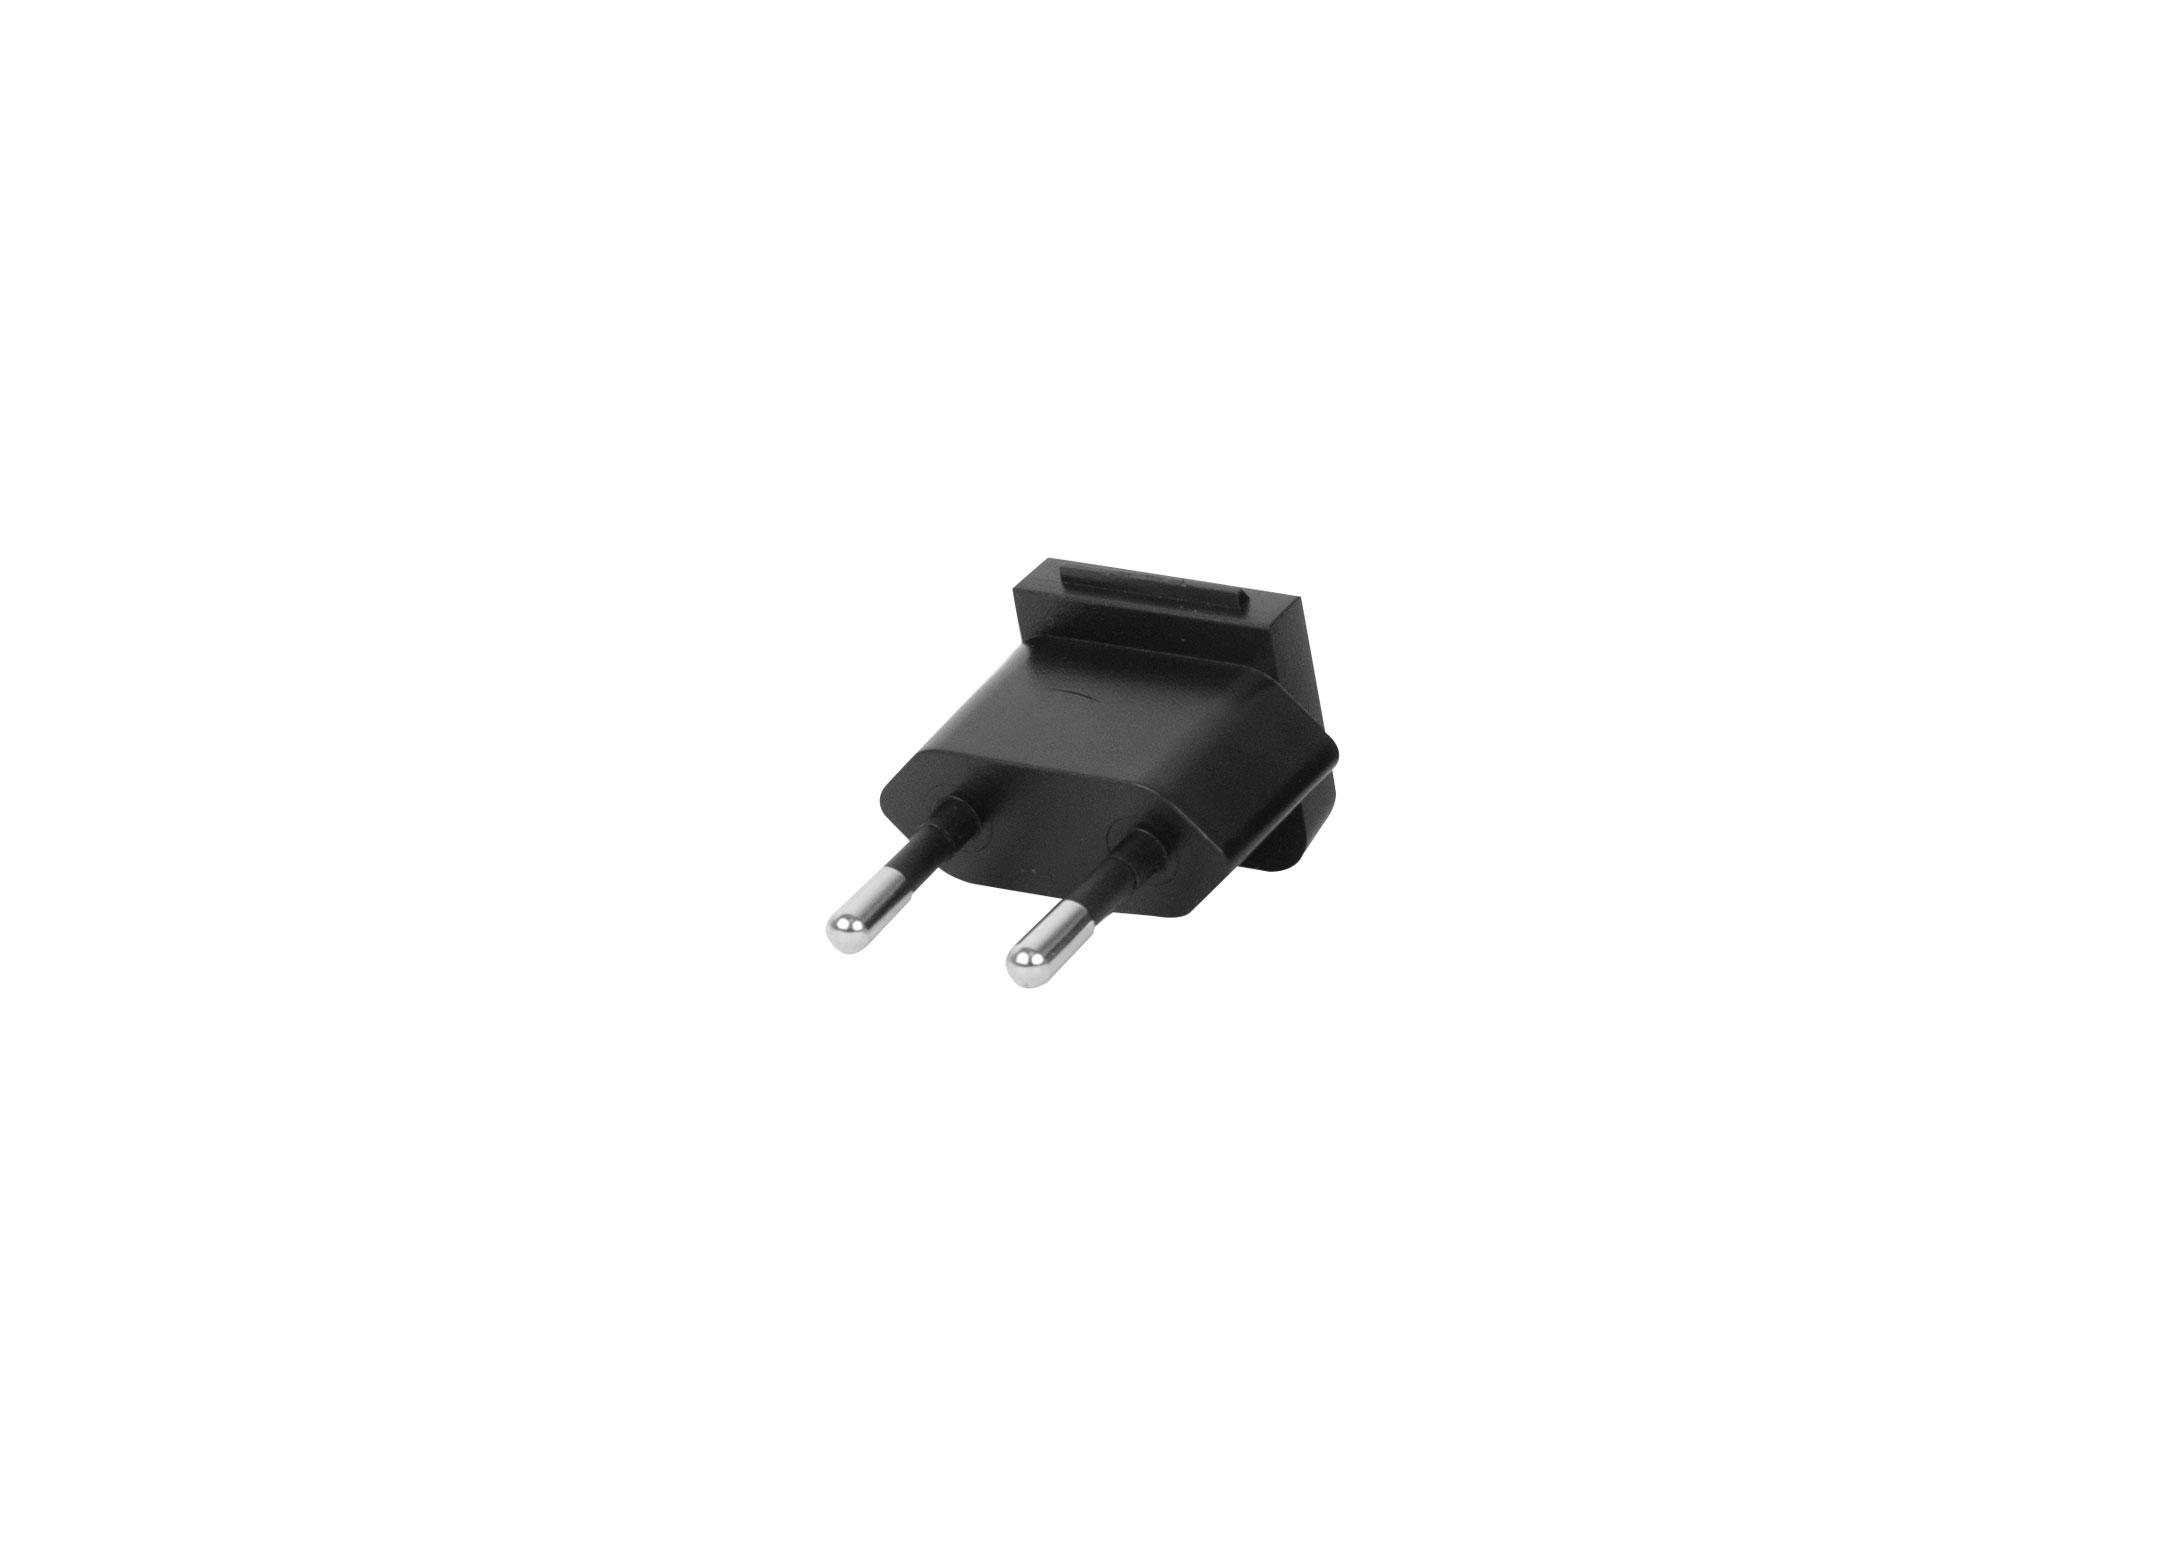 Heiniger Adaptor EU Plug - OLD